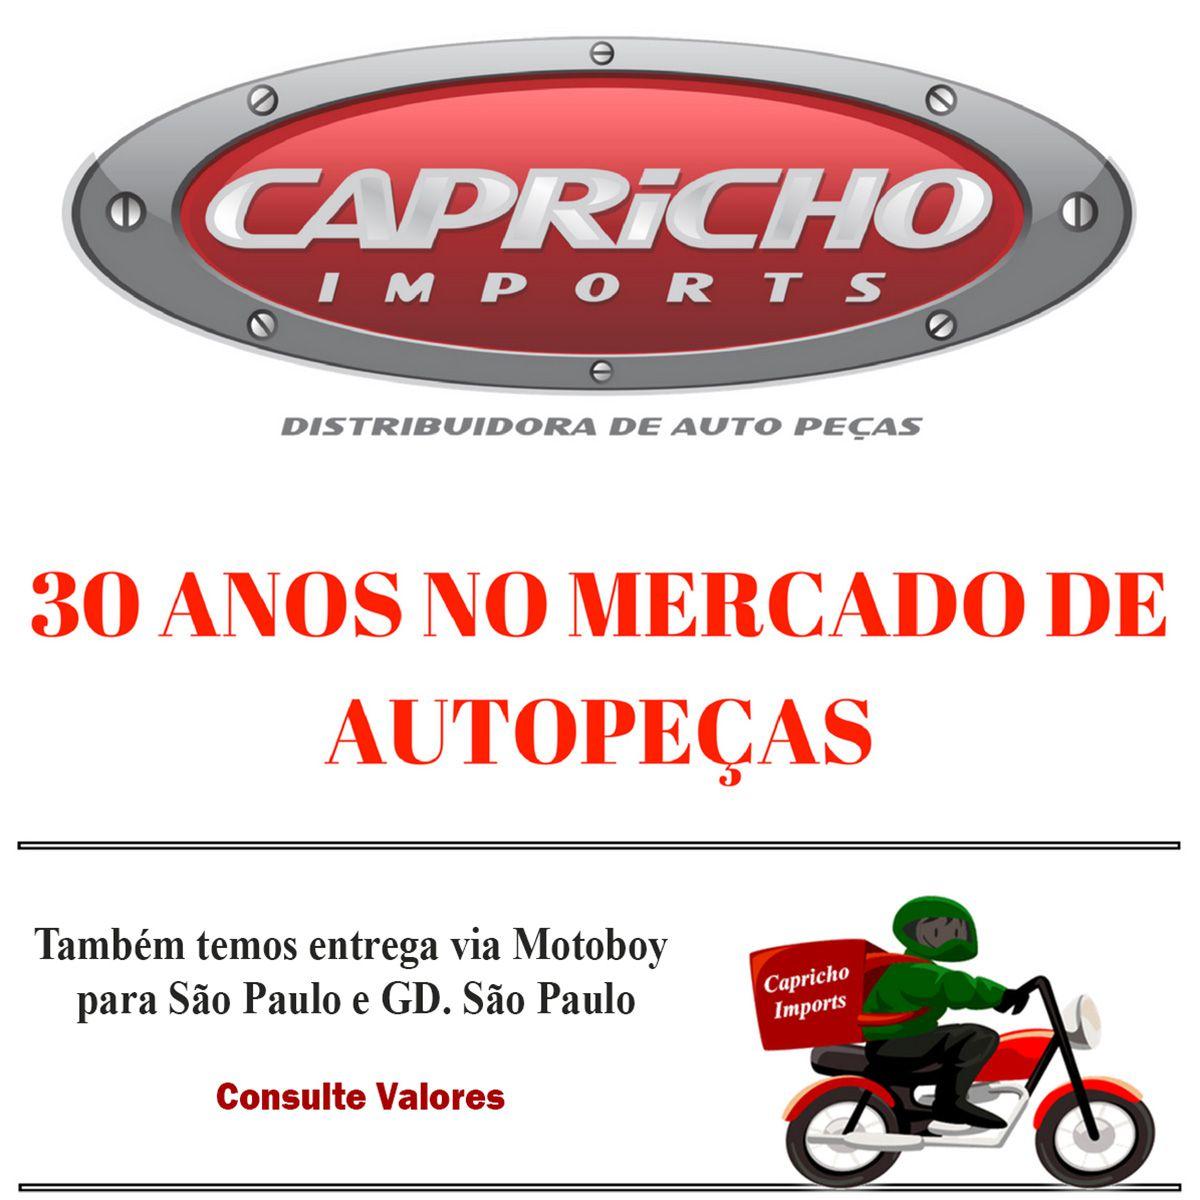 KIT CORRENTE DE COMANDO FOCUS 2.0 2005 - 2007 MONDEO 2001 - 2005